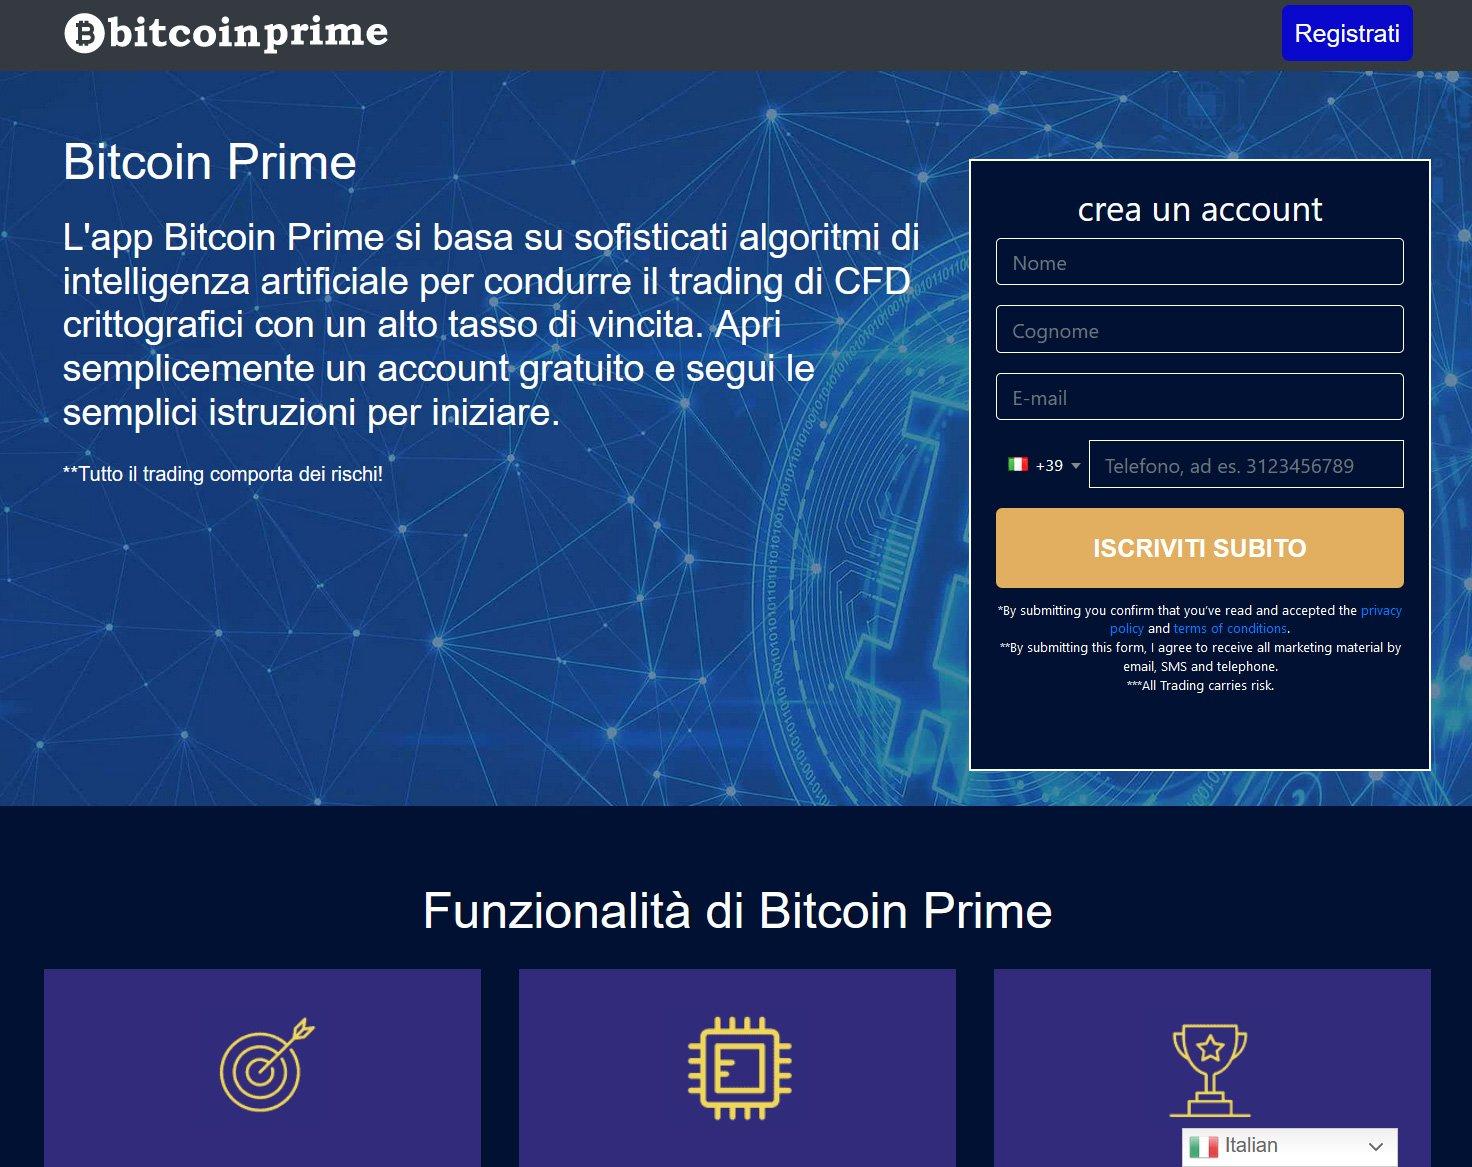 Bitcoinprime.io Home page